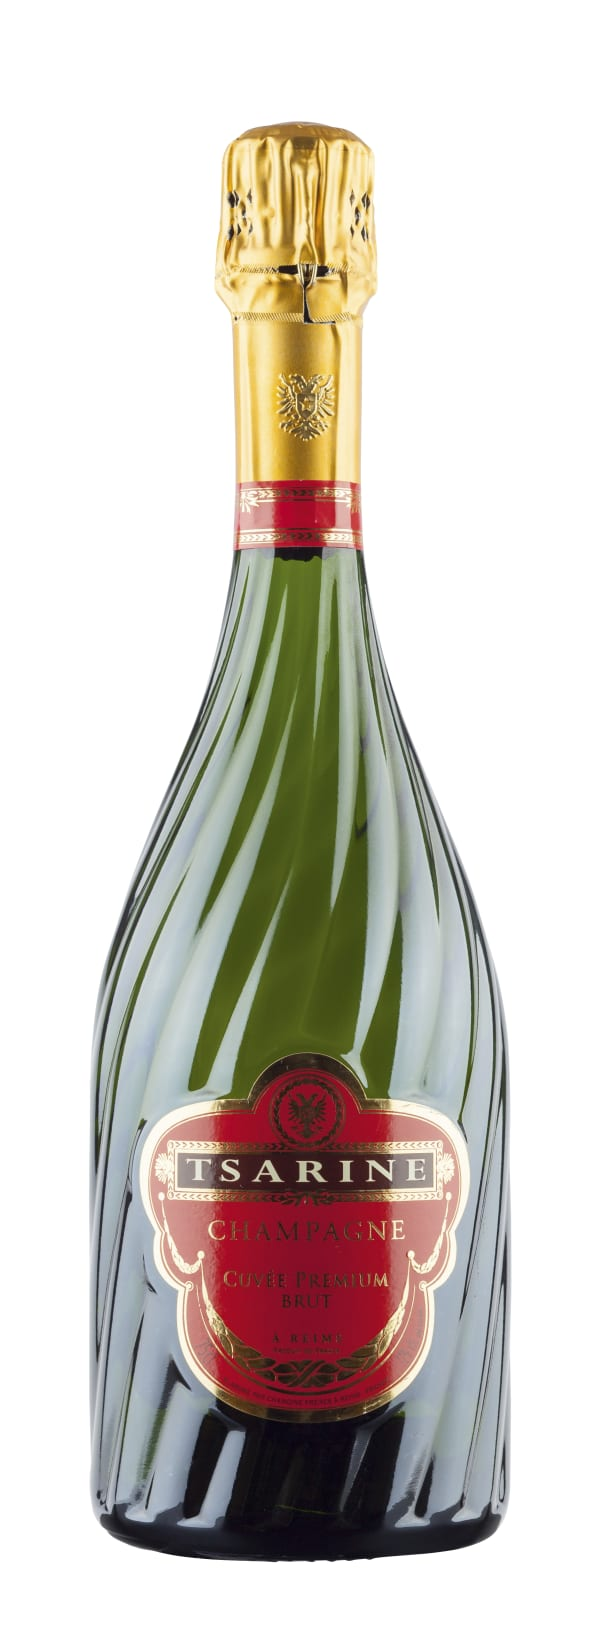 Chanoine Frères Tsarine Champagne Brut